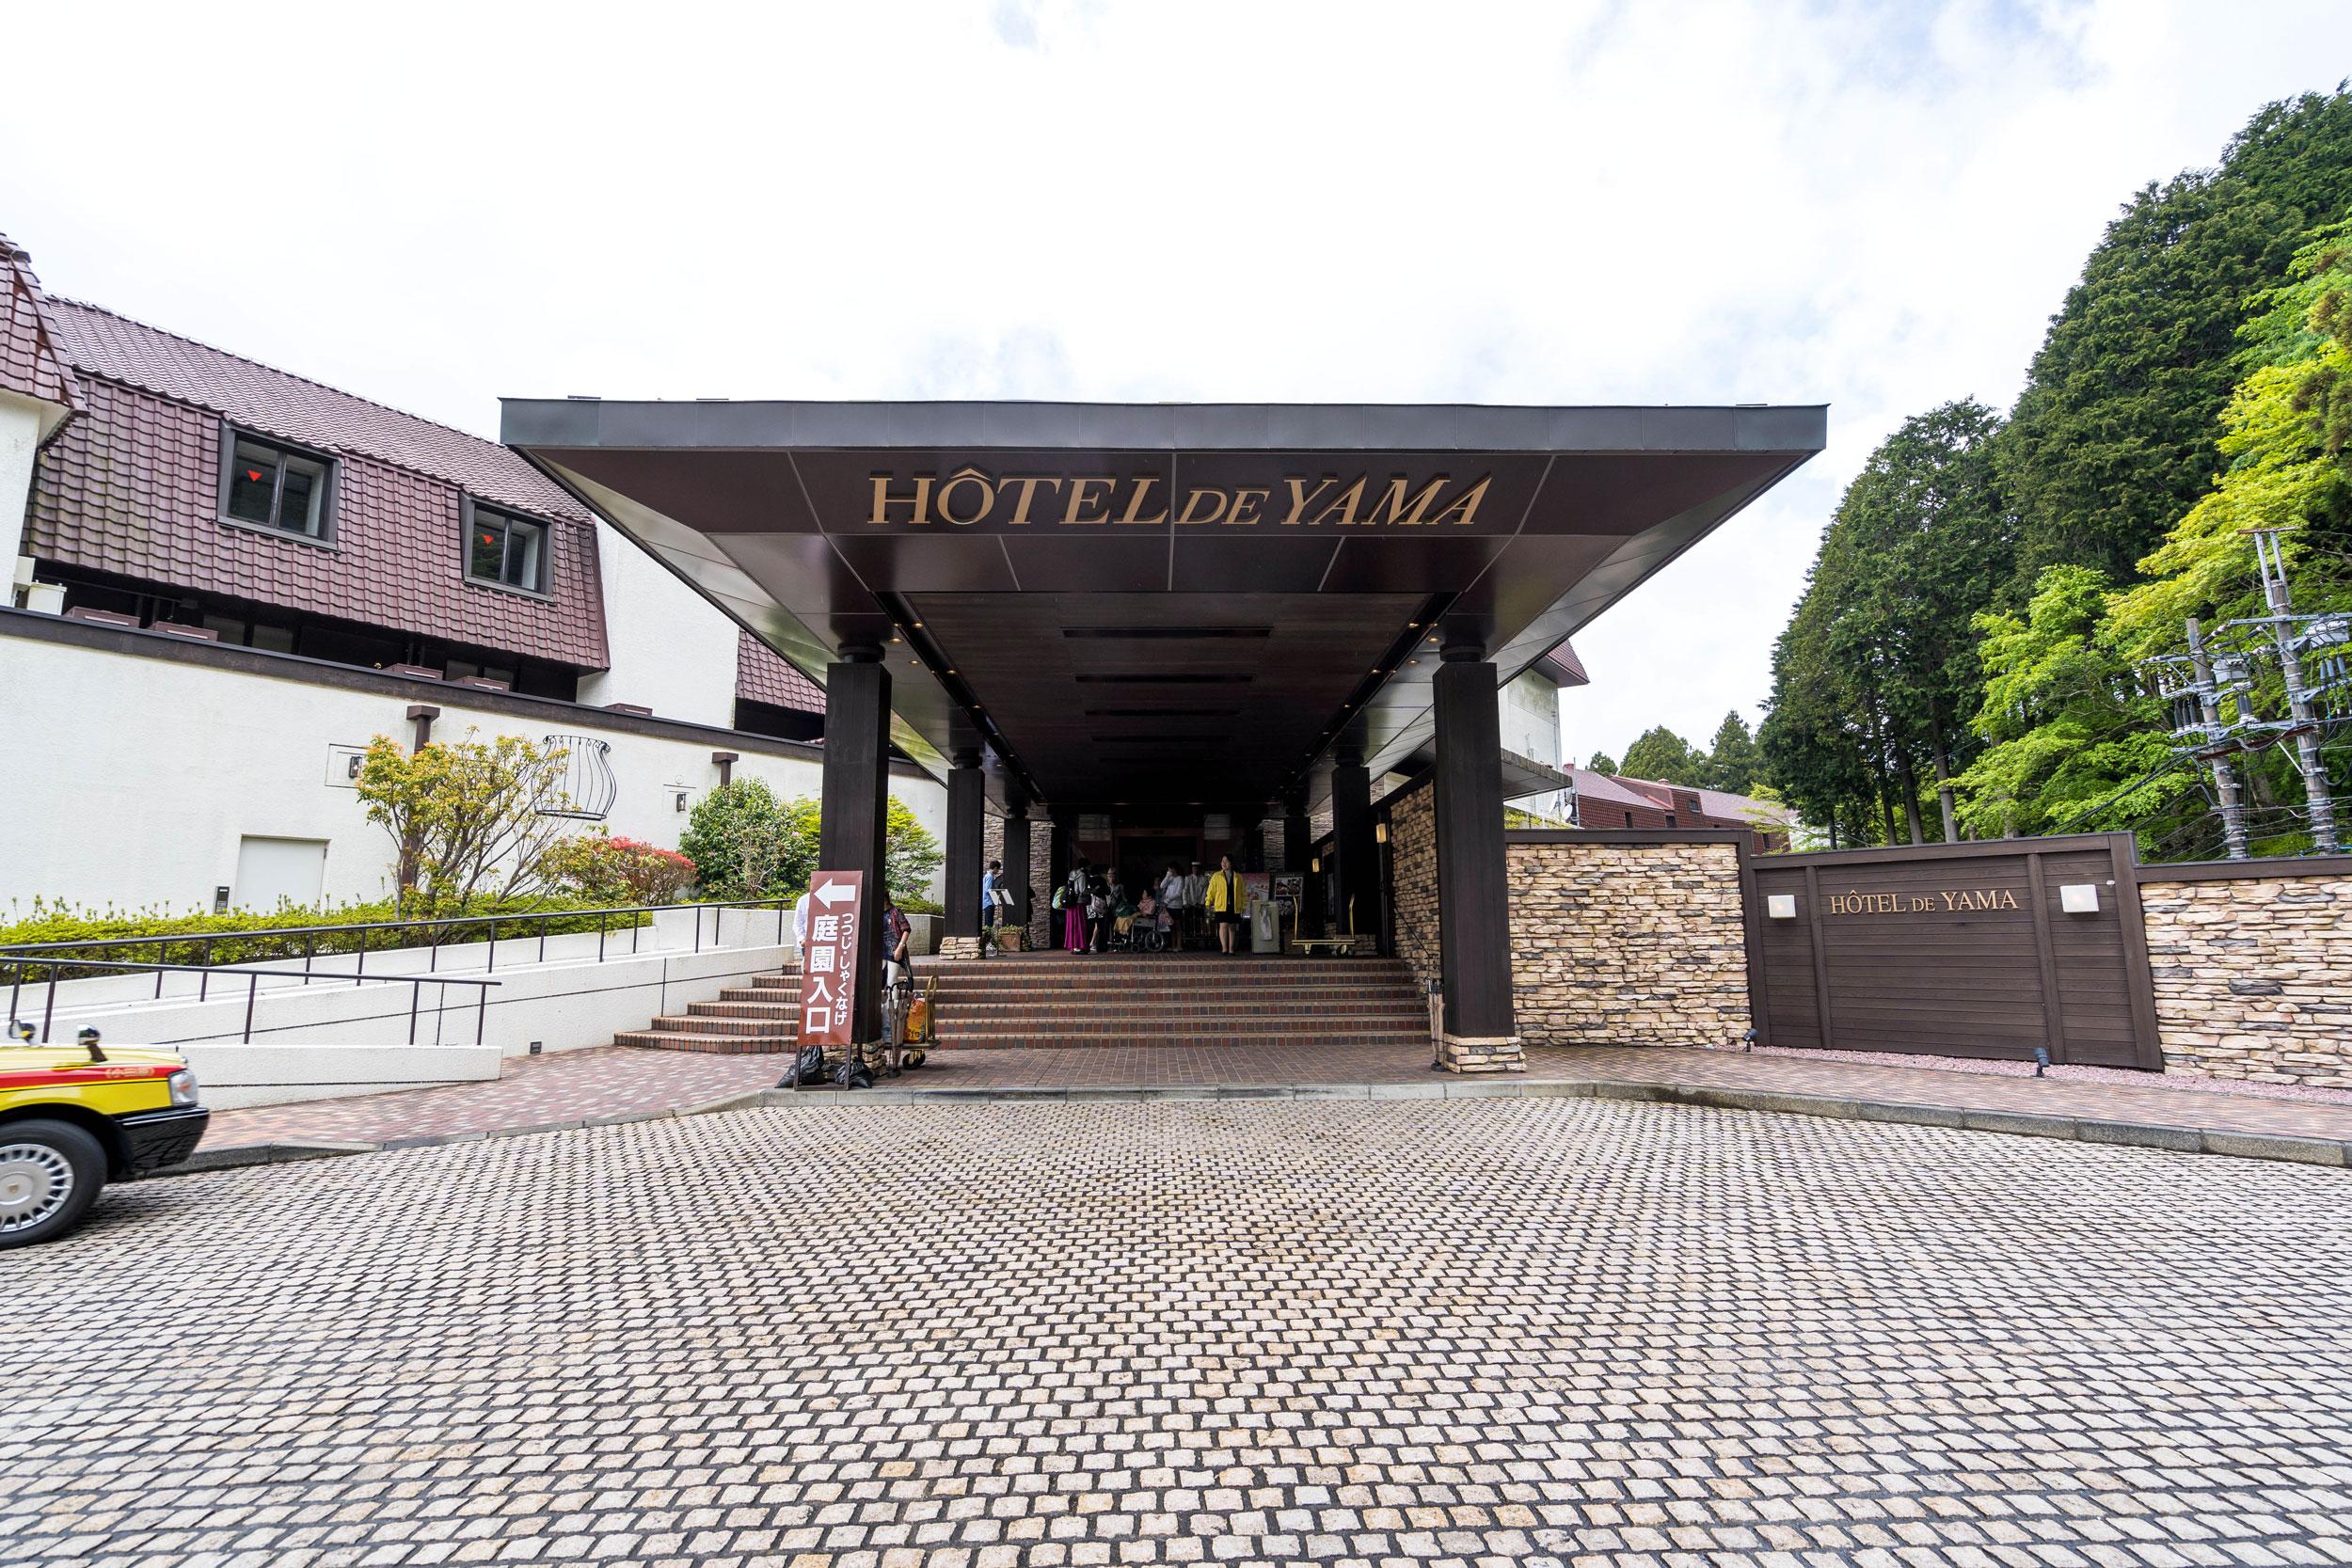 Entrance to Hotel de Yama